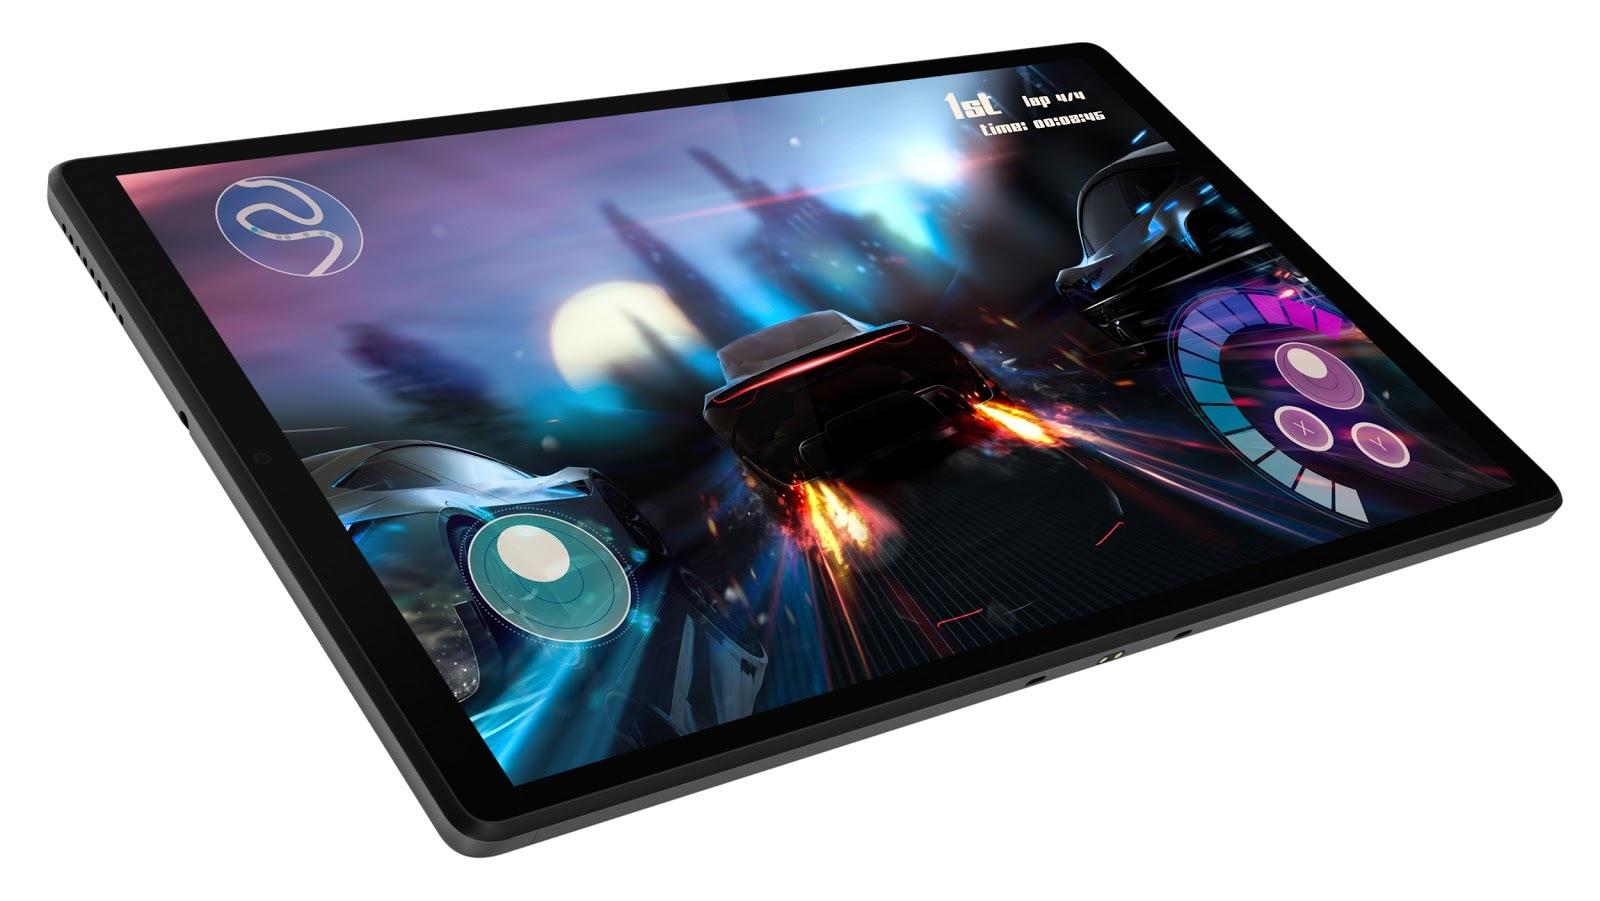 планшет Lenovo, планшет, Lenovo, купить планшет, Lenovo M8 WiFi 2/32 Iron Grey, Lenovo M8, Lenovo Tab M10 Plus FHD 4/64 LTE Iron Grey, Lenovo Tab M10, планшеты, интернет магазин, магазин Lenovo